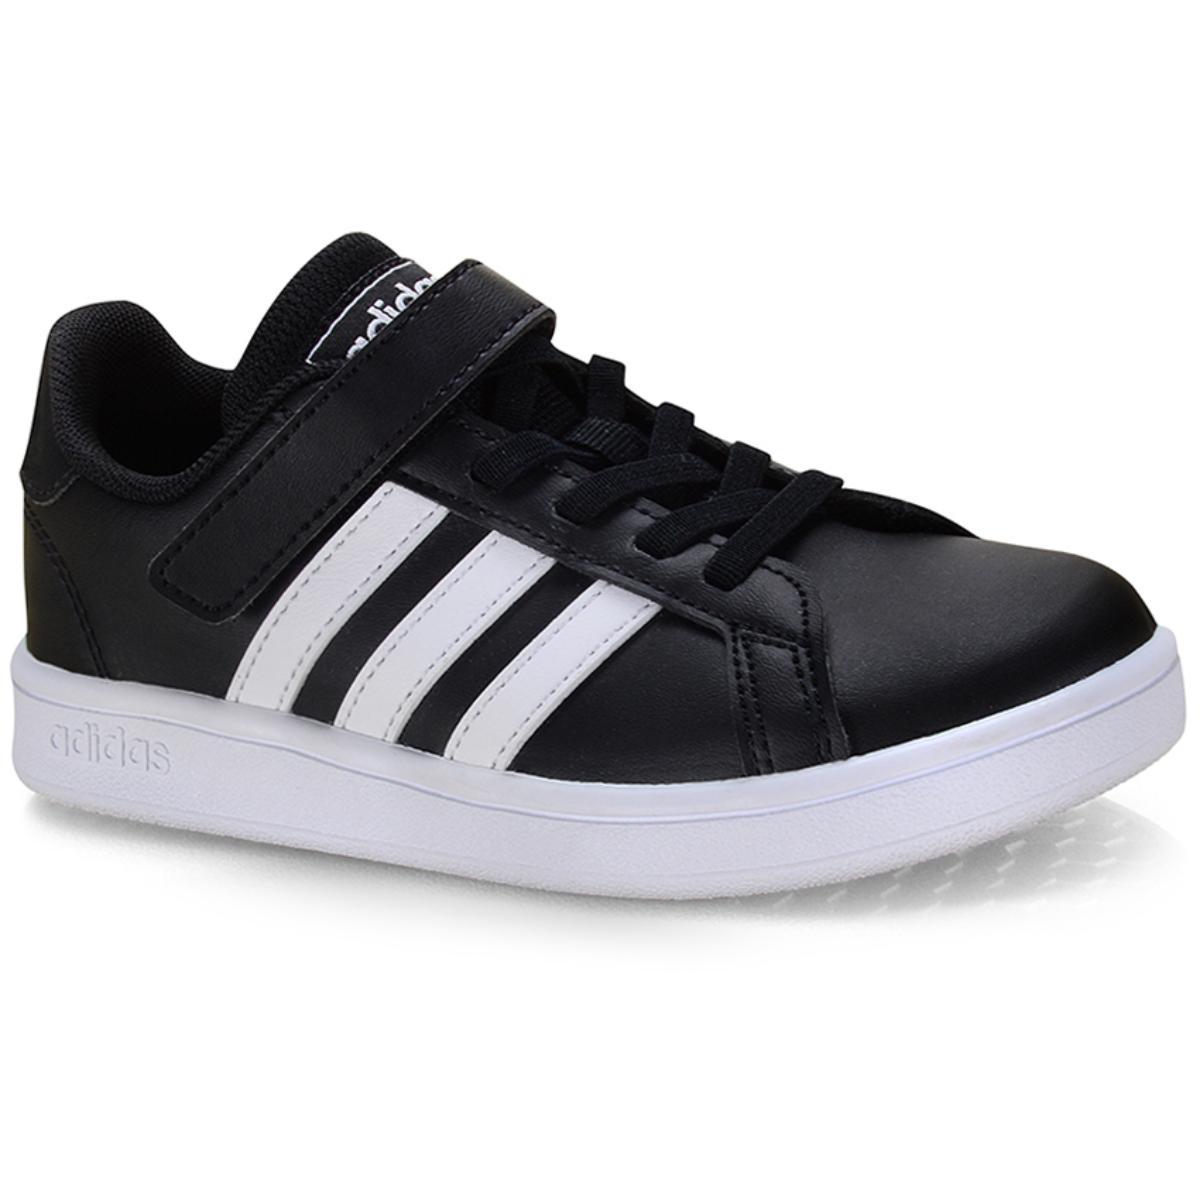 Tênis Uni Infantil Adidas Ef0108 Grand Court c Preto/branco